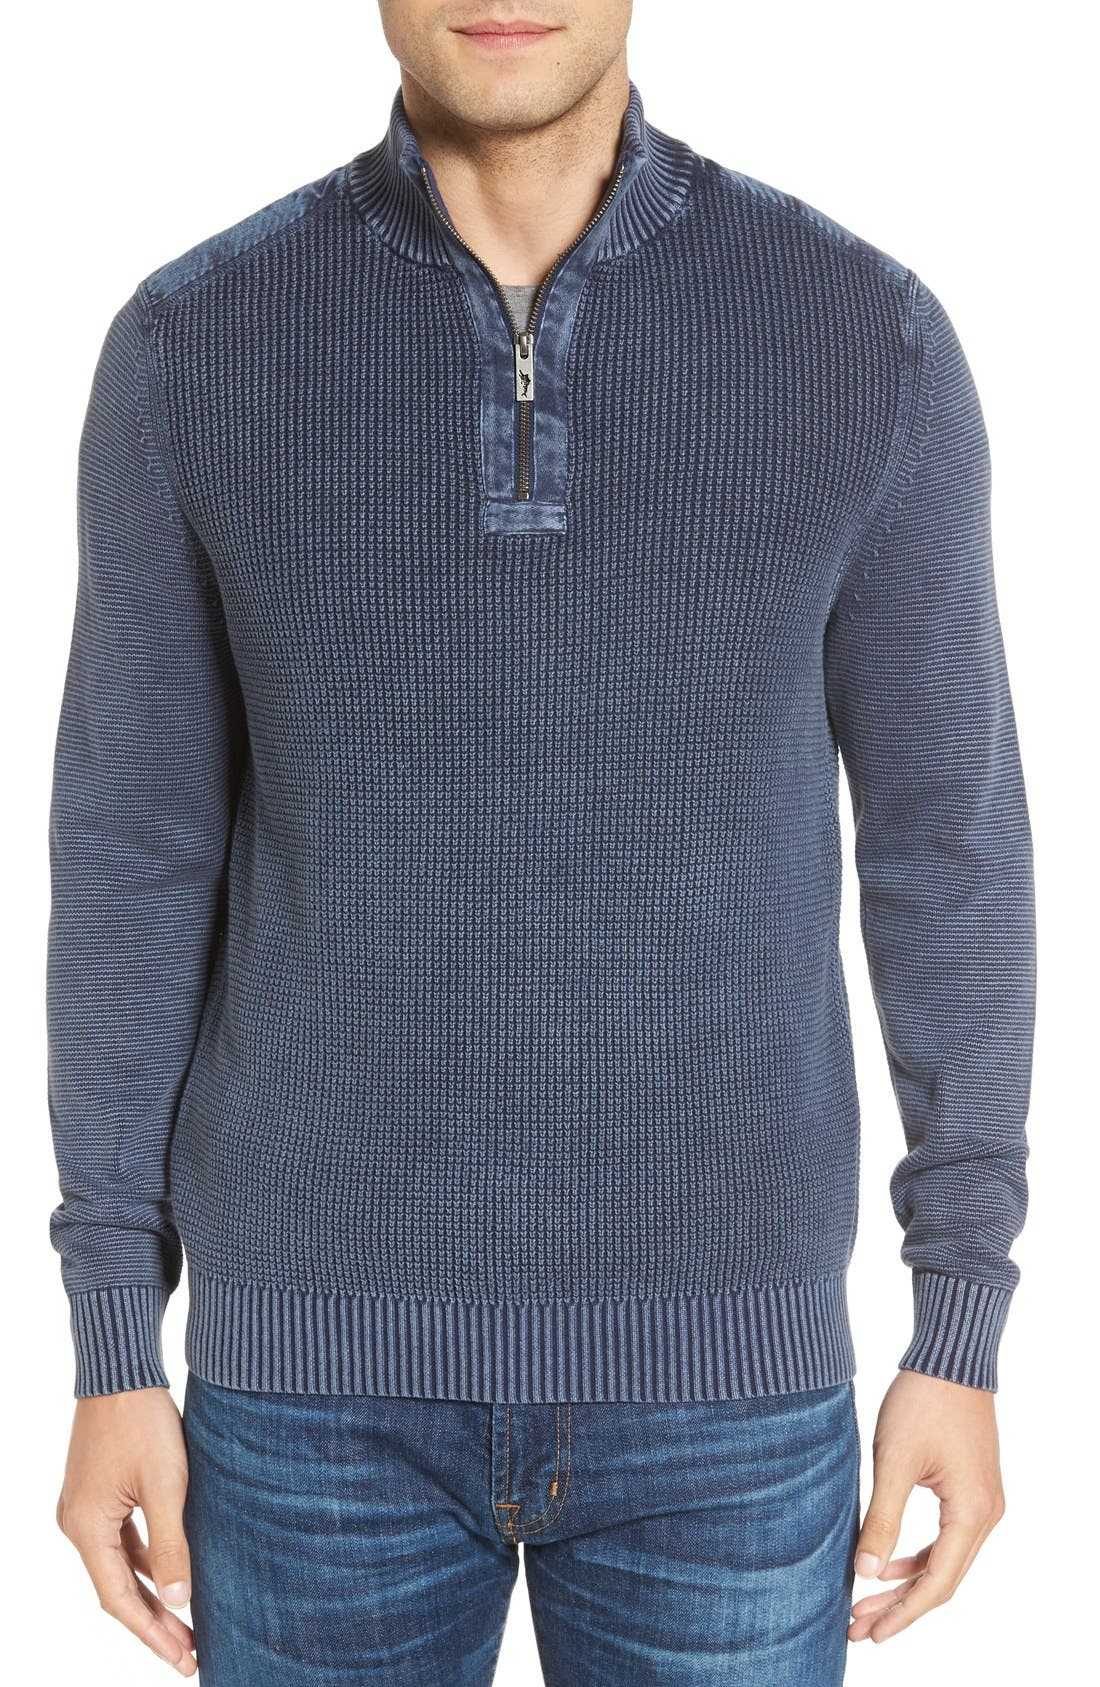 'Coastal Shores' Quarter Zip Sweater,                             Main thumbnail 8, color,